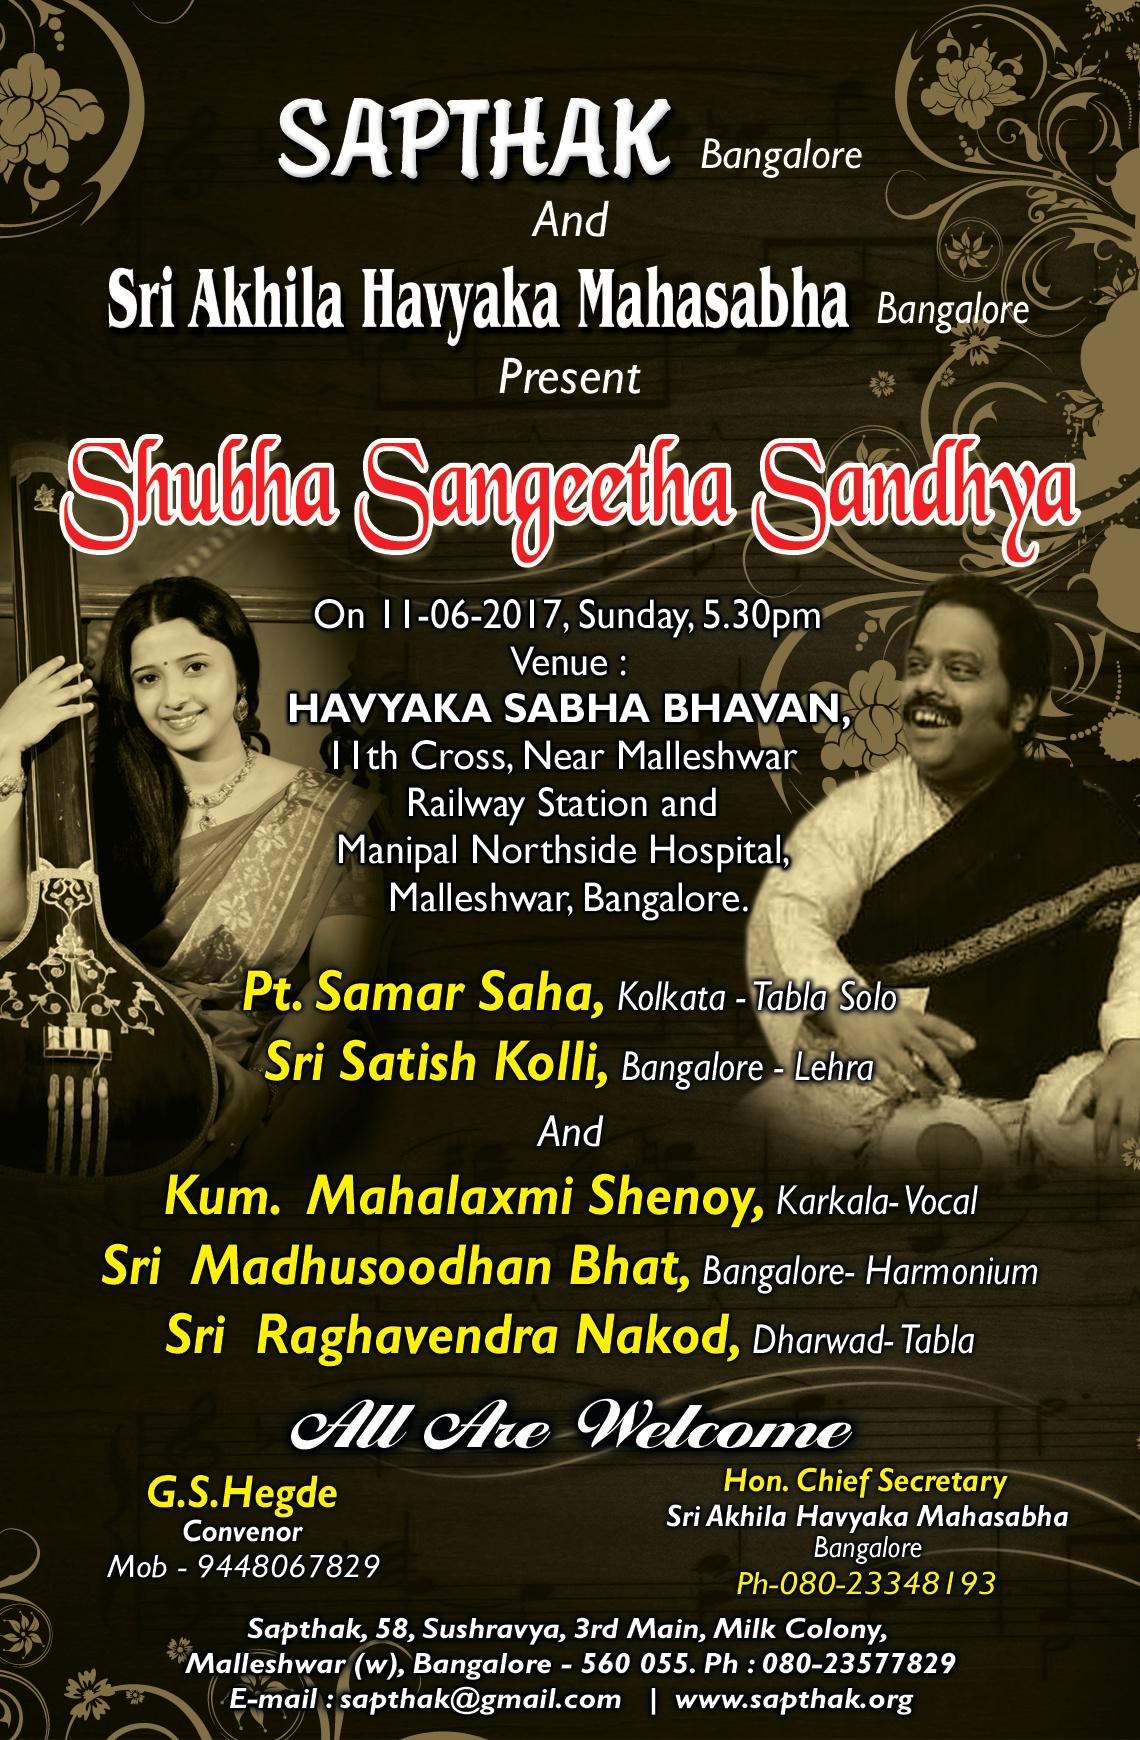 SHUBHA SANGEETHA SANDYA Eng